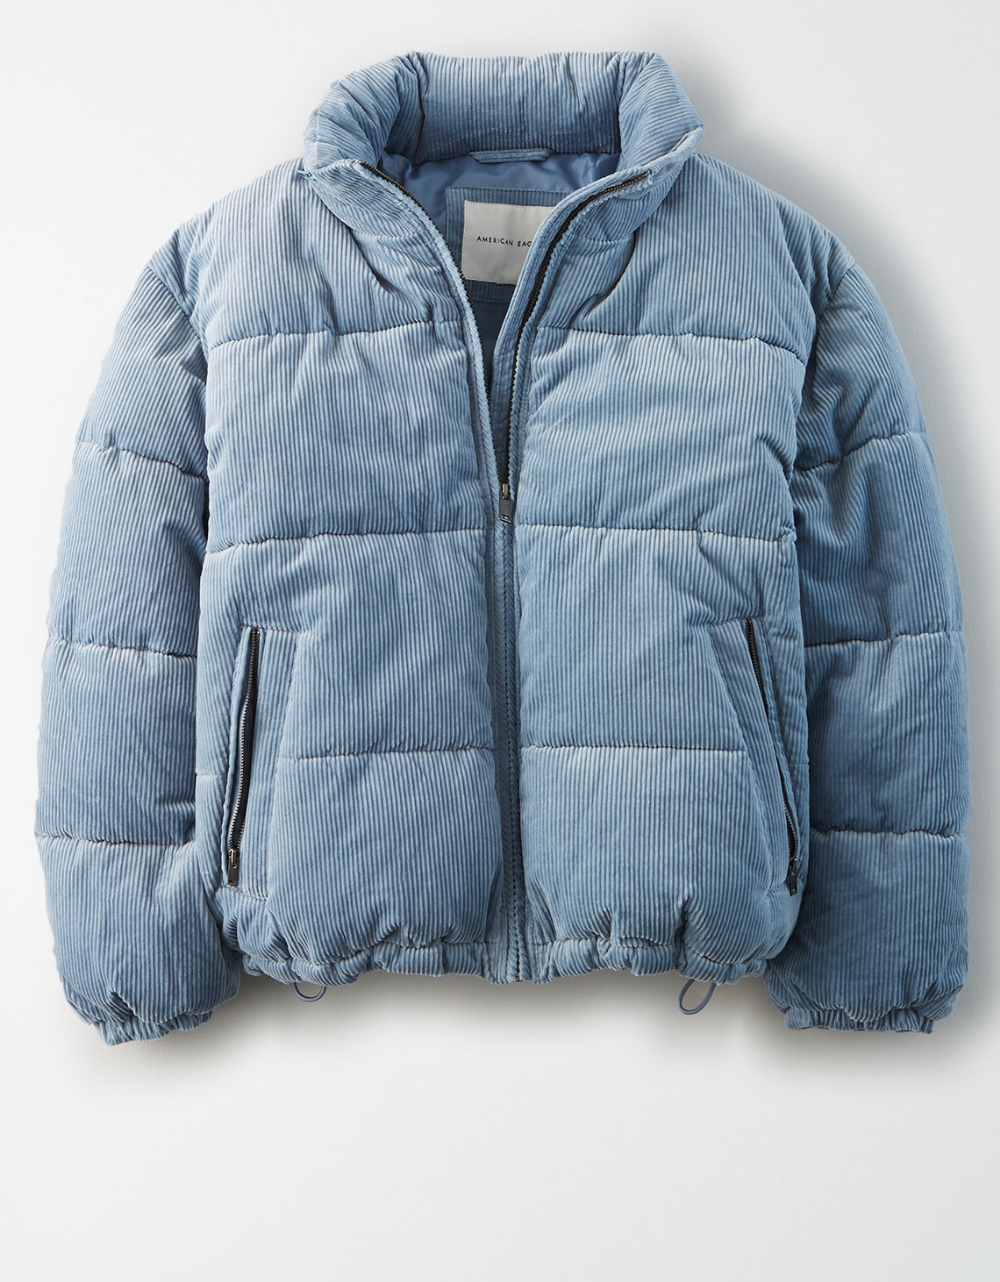 Ae Corduroy Puffer Jacket Winter Jacket Outfits Corduroy Puffer Jacket Jackets [ 1282 x 1000 Pixel ]